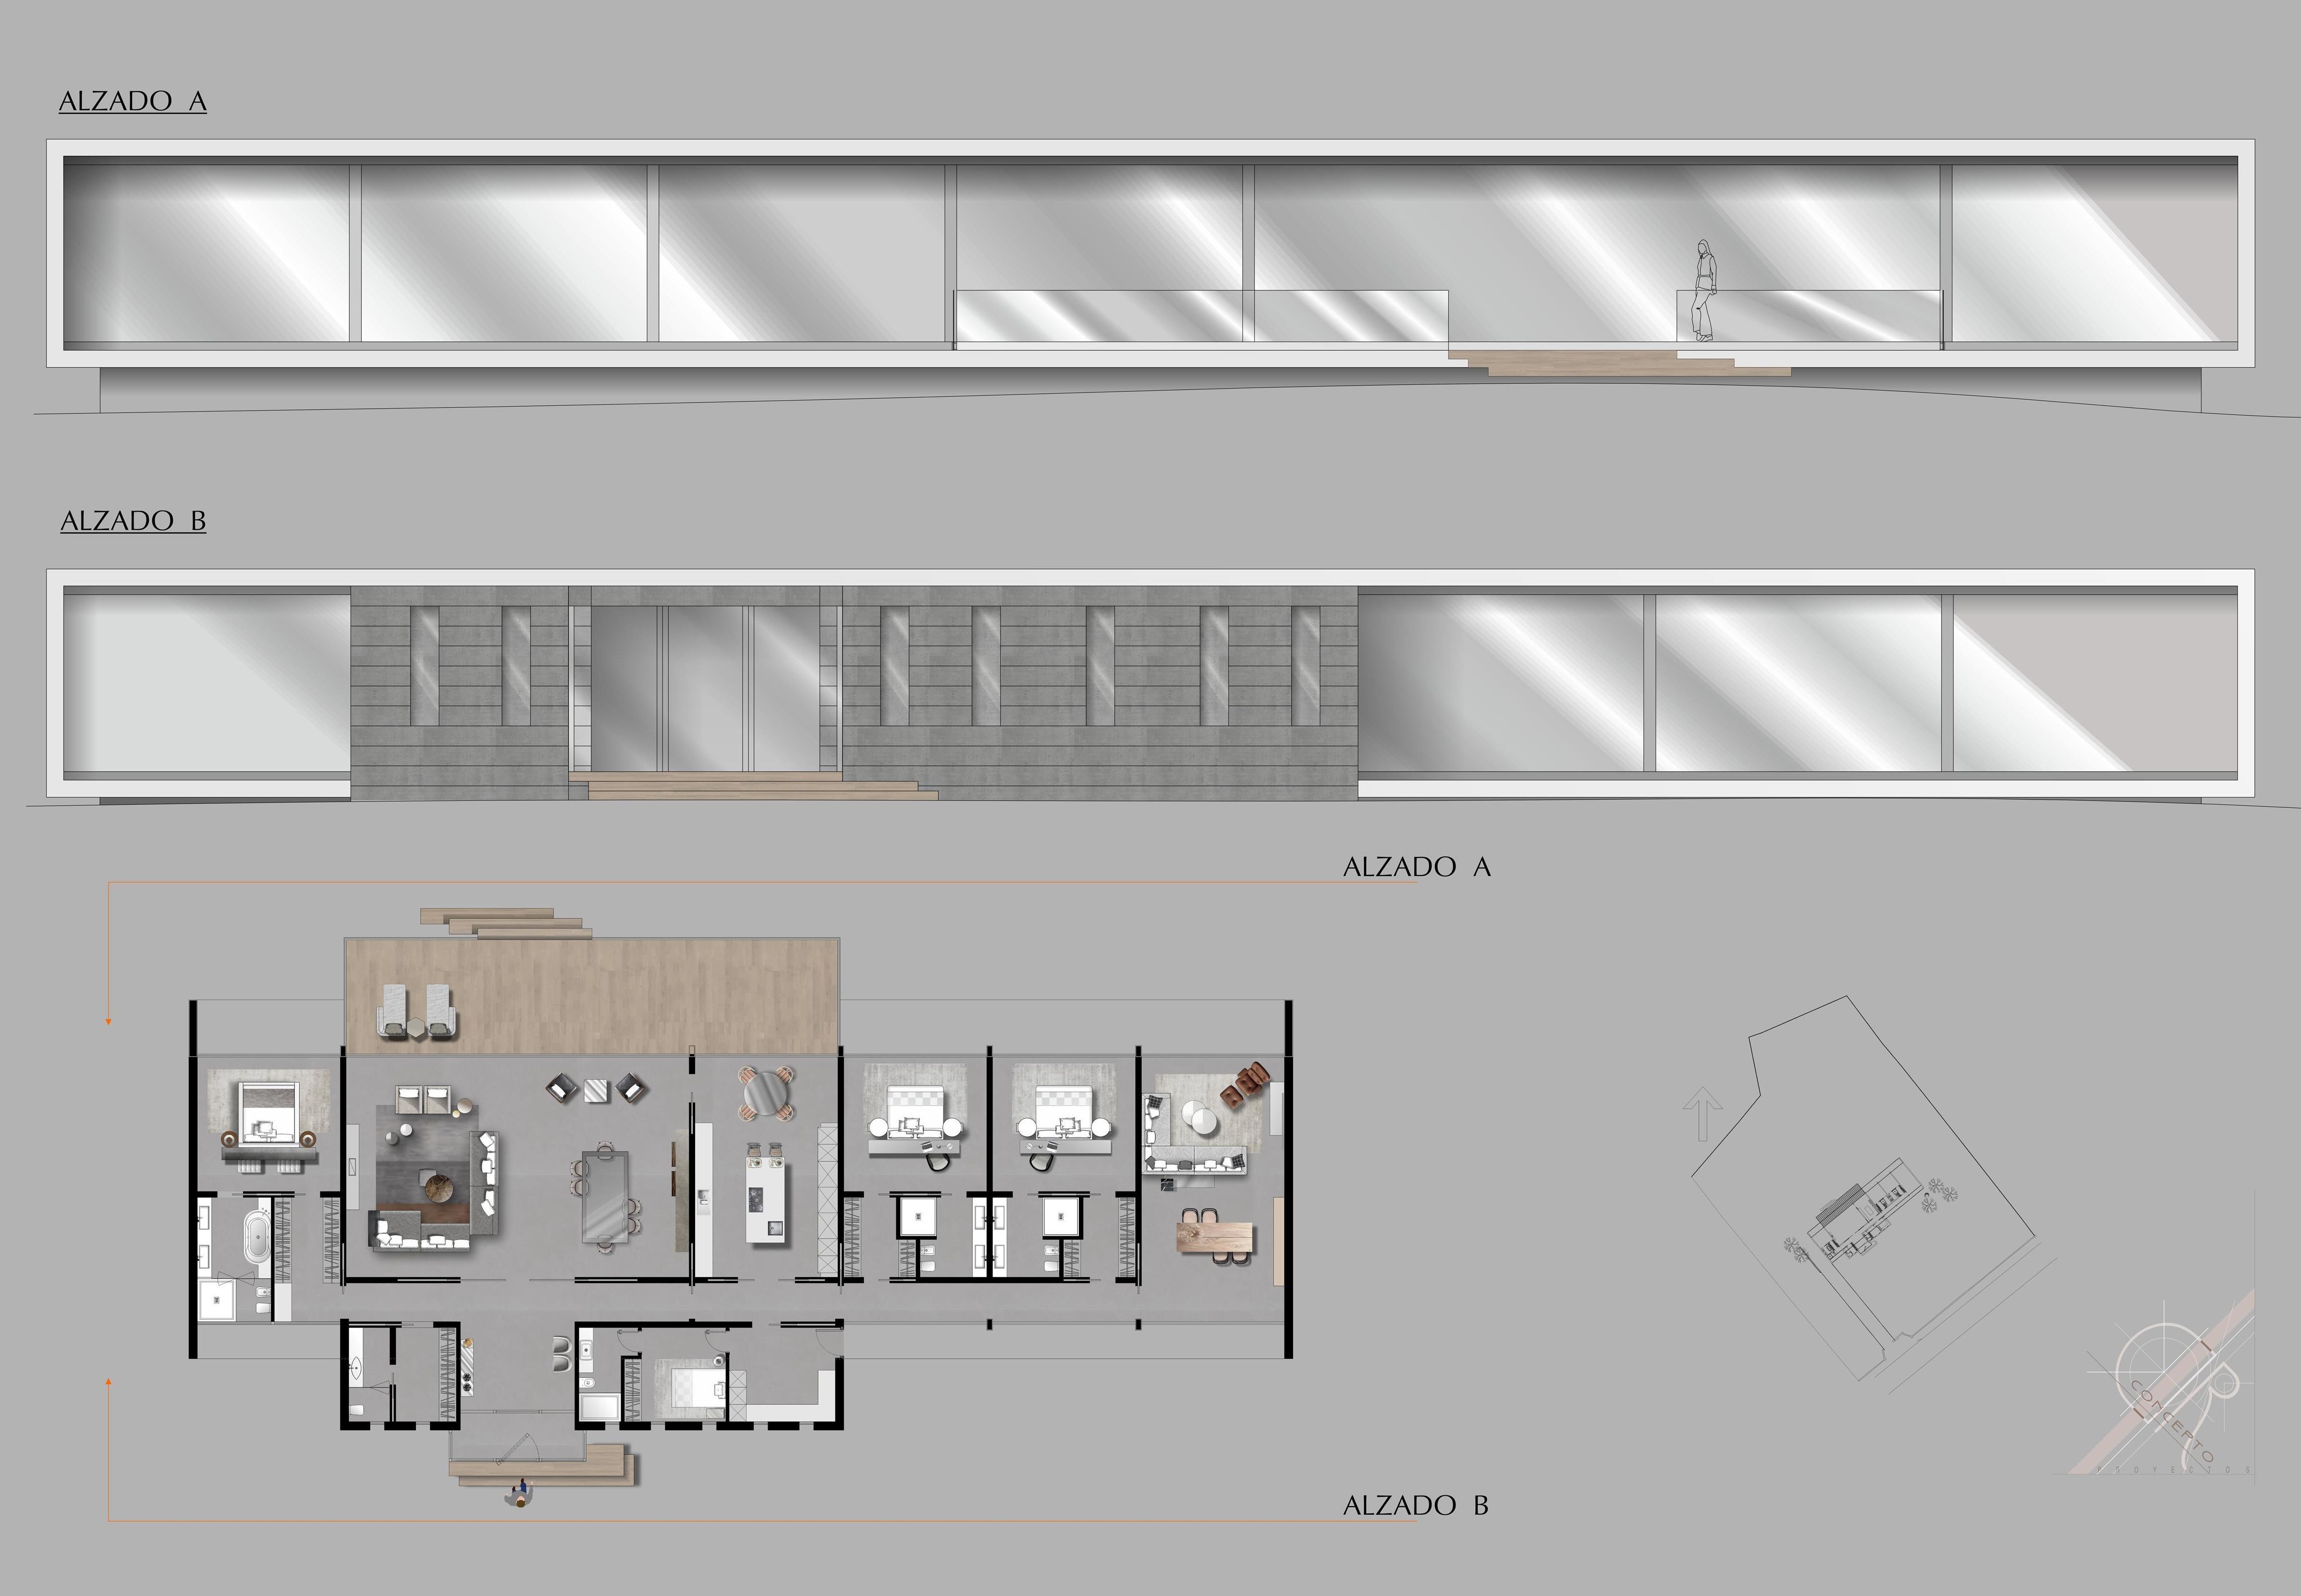 Ignacio Pereda Pérez | Estudio de arquitectura Santander